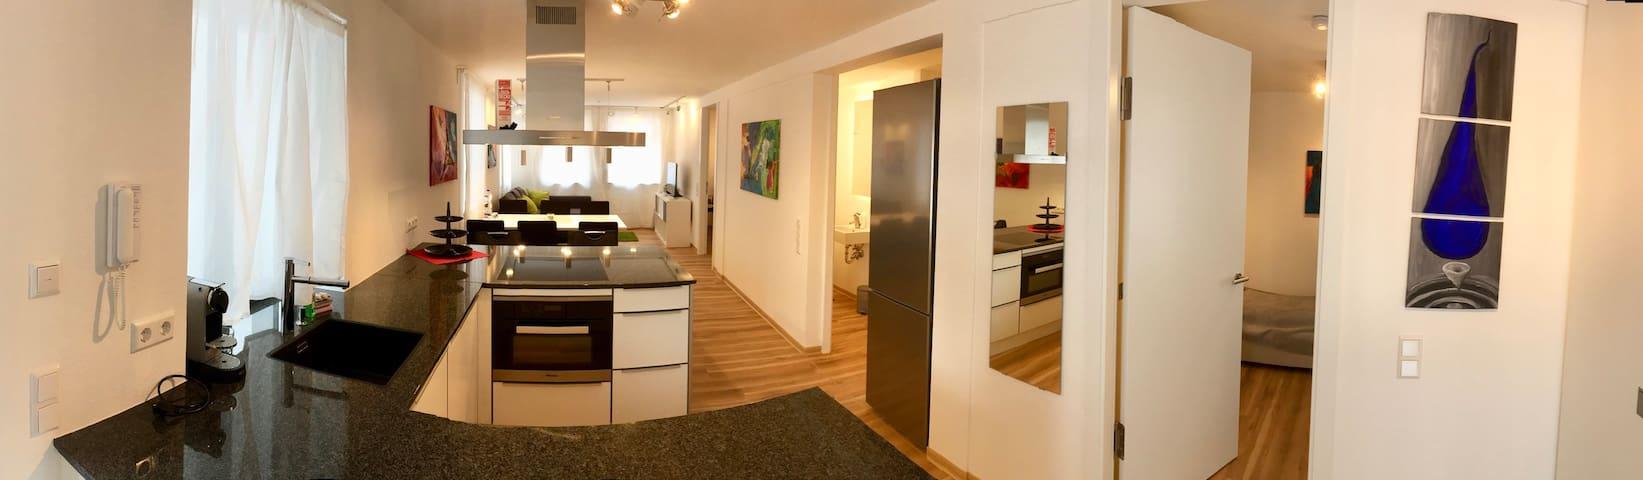 Exkl. 3Z Stadt Apartment Hight Level bis 5 P WLAN